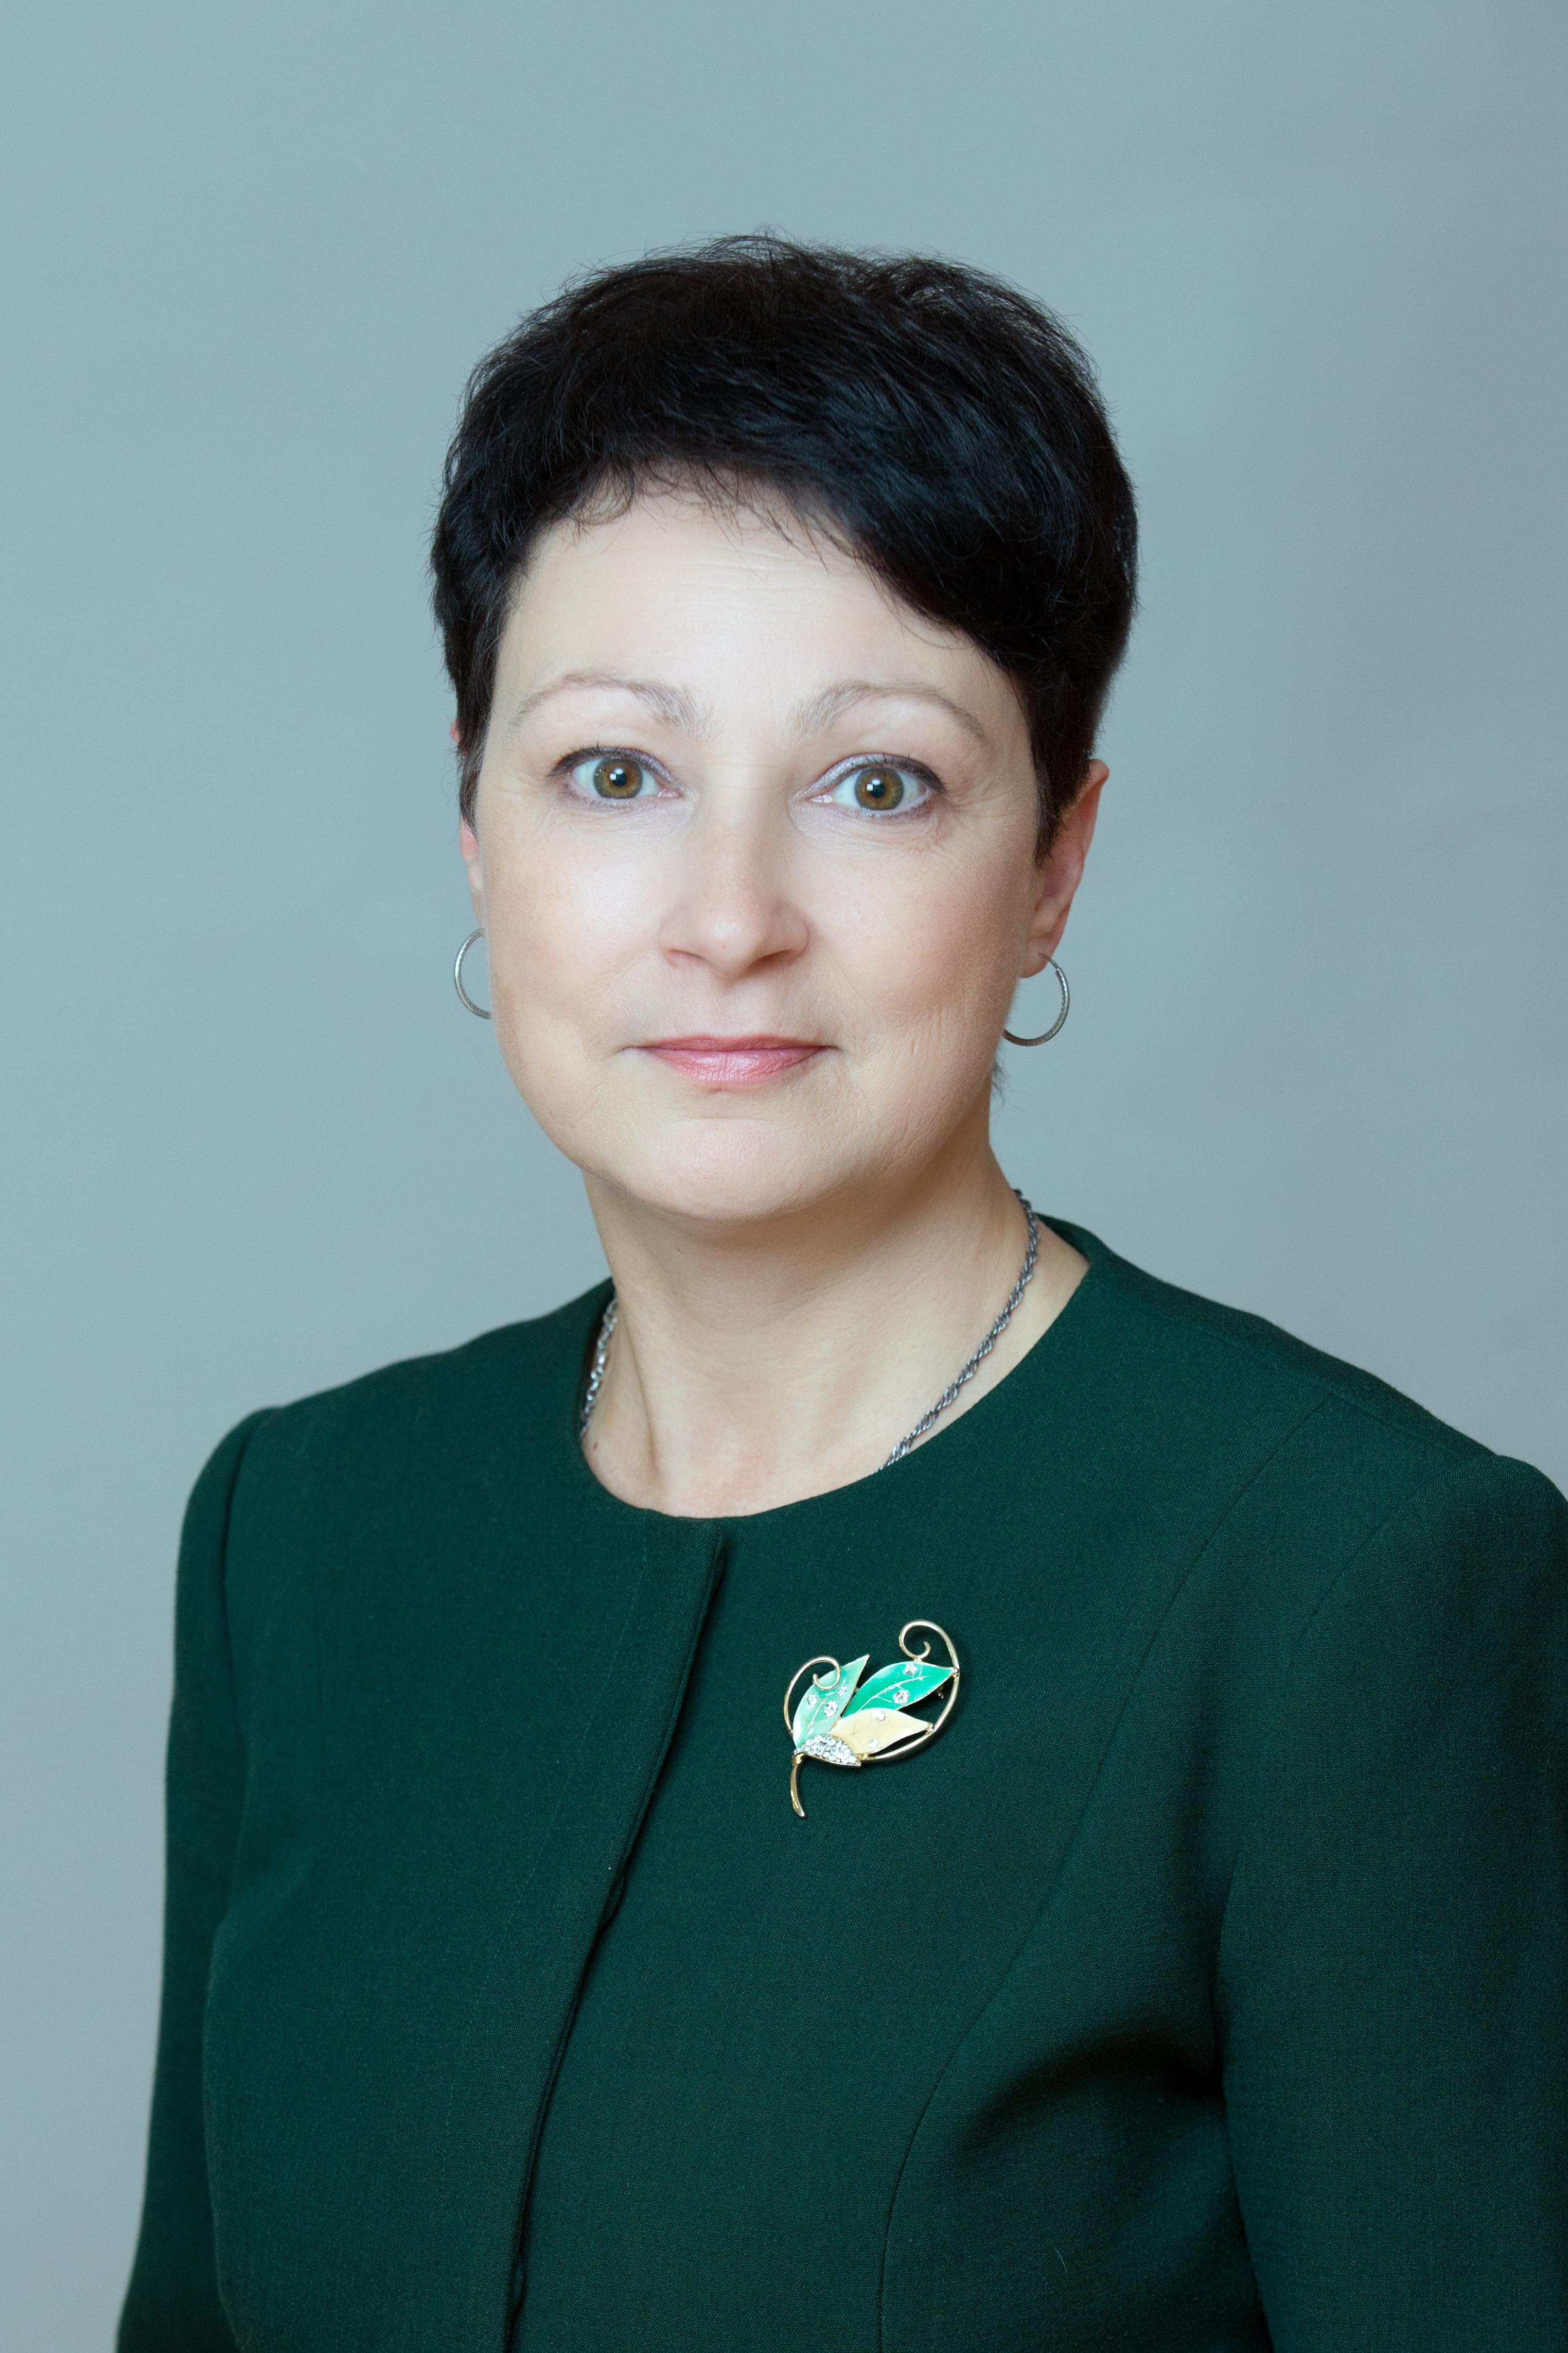 Пономарева Татьяна Евгеньевна